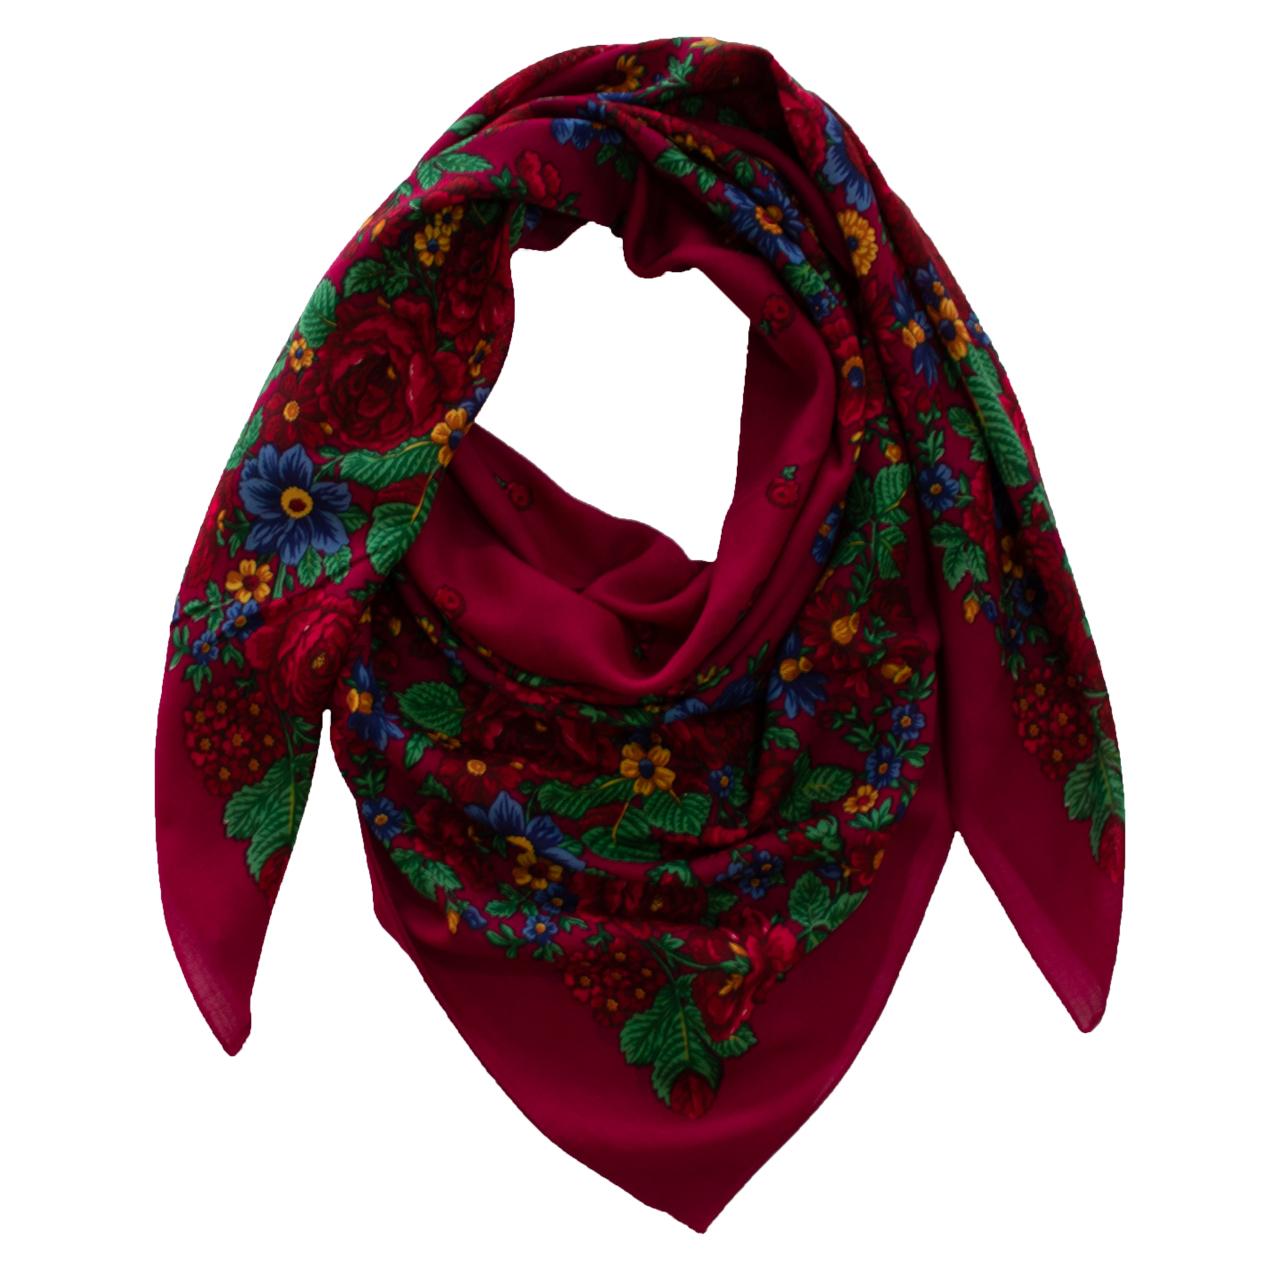 روسری زنانه کد 0002